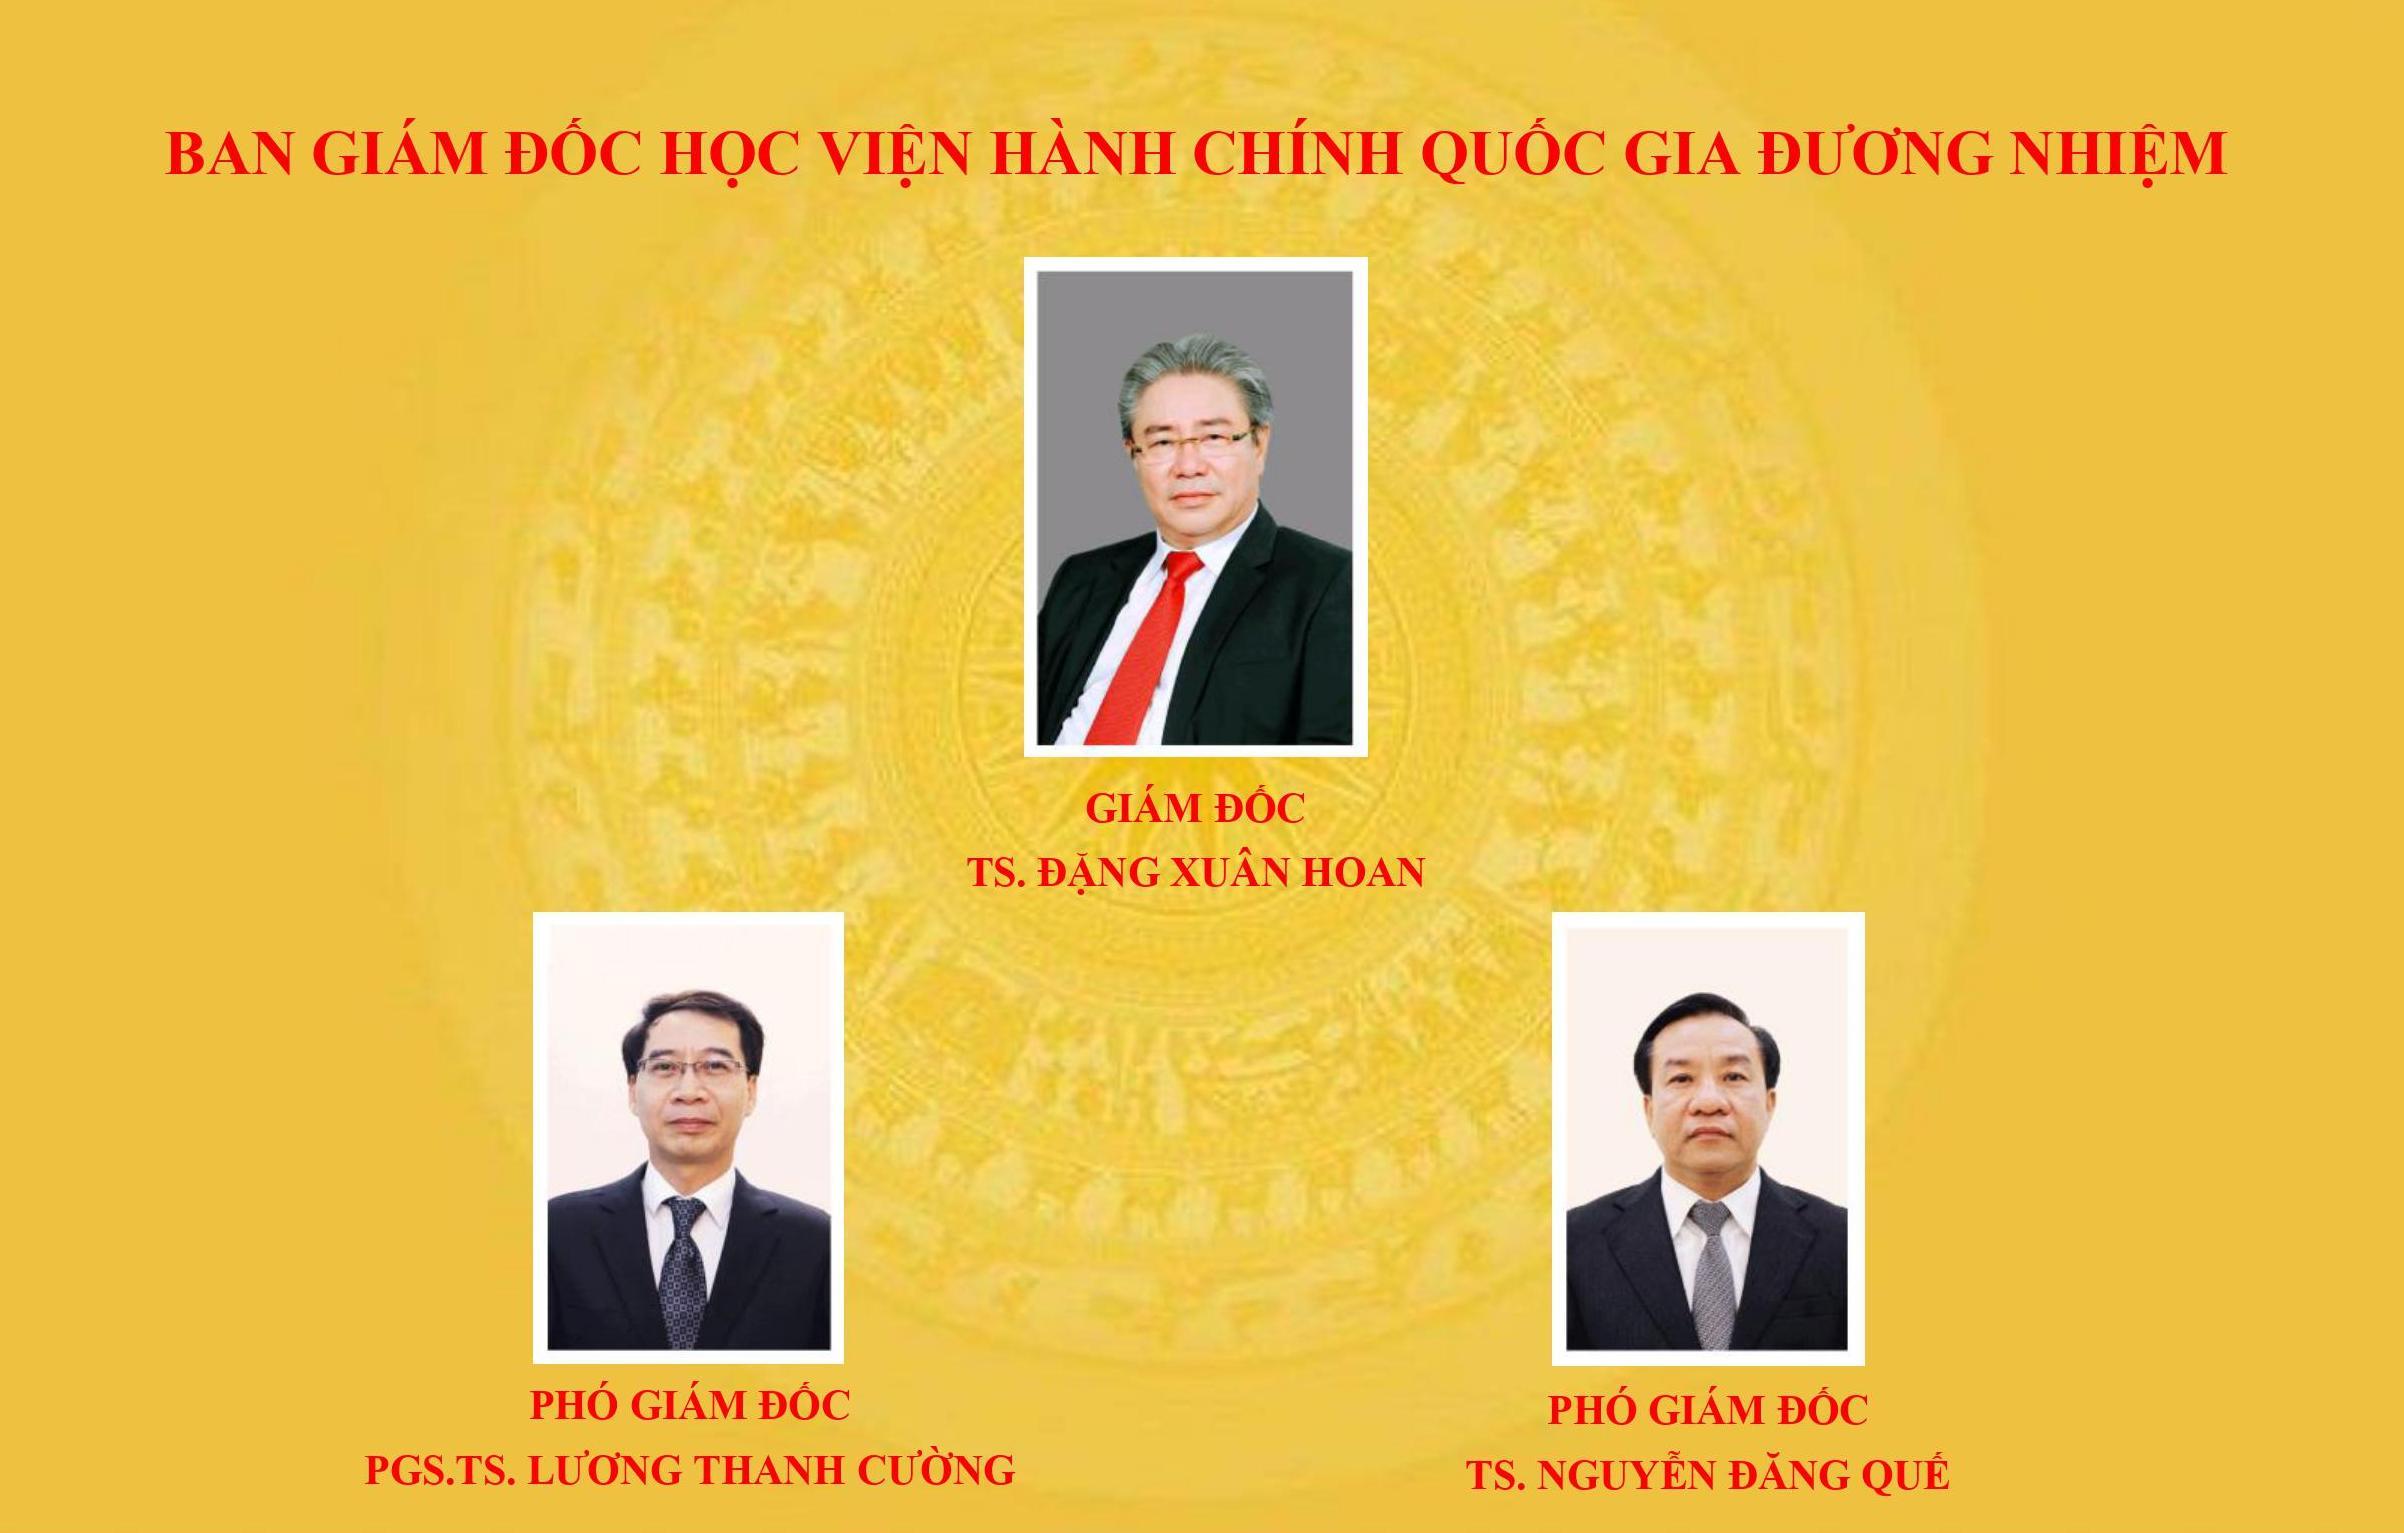 Ban Giam doc Hoc vien